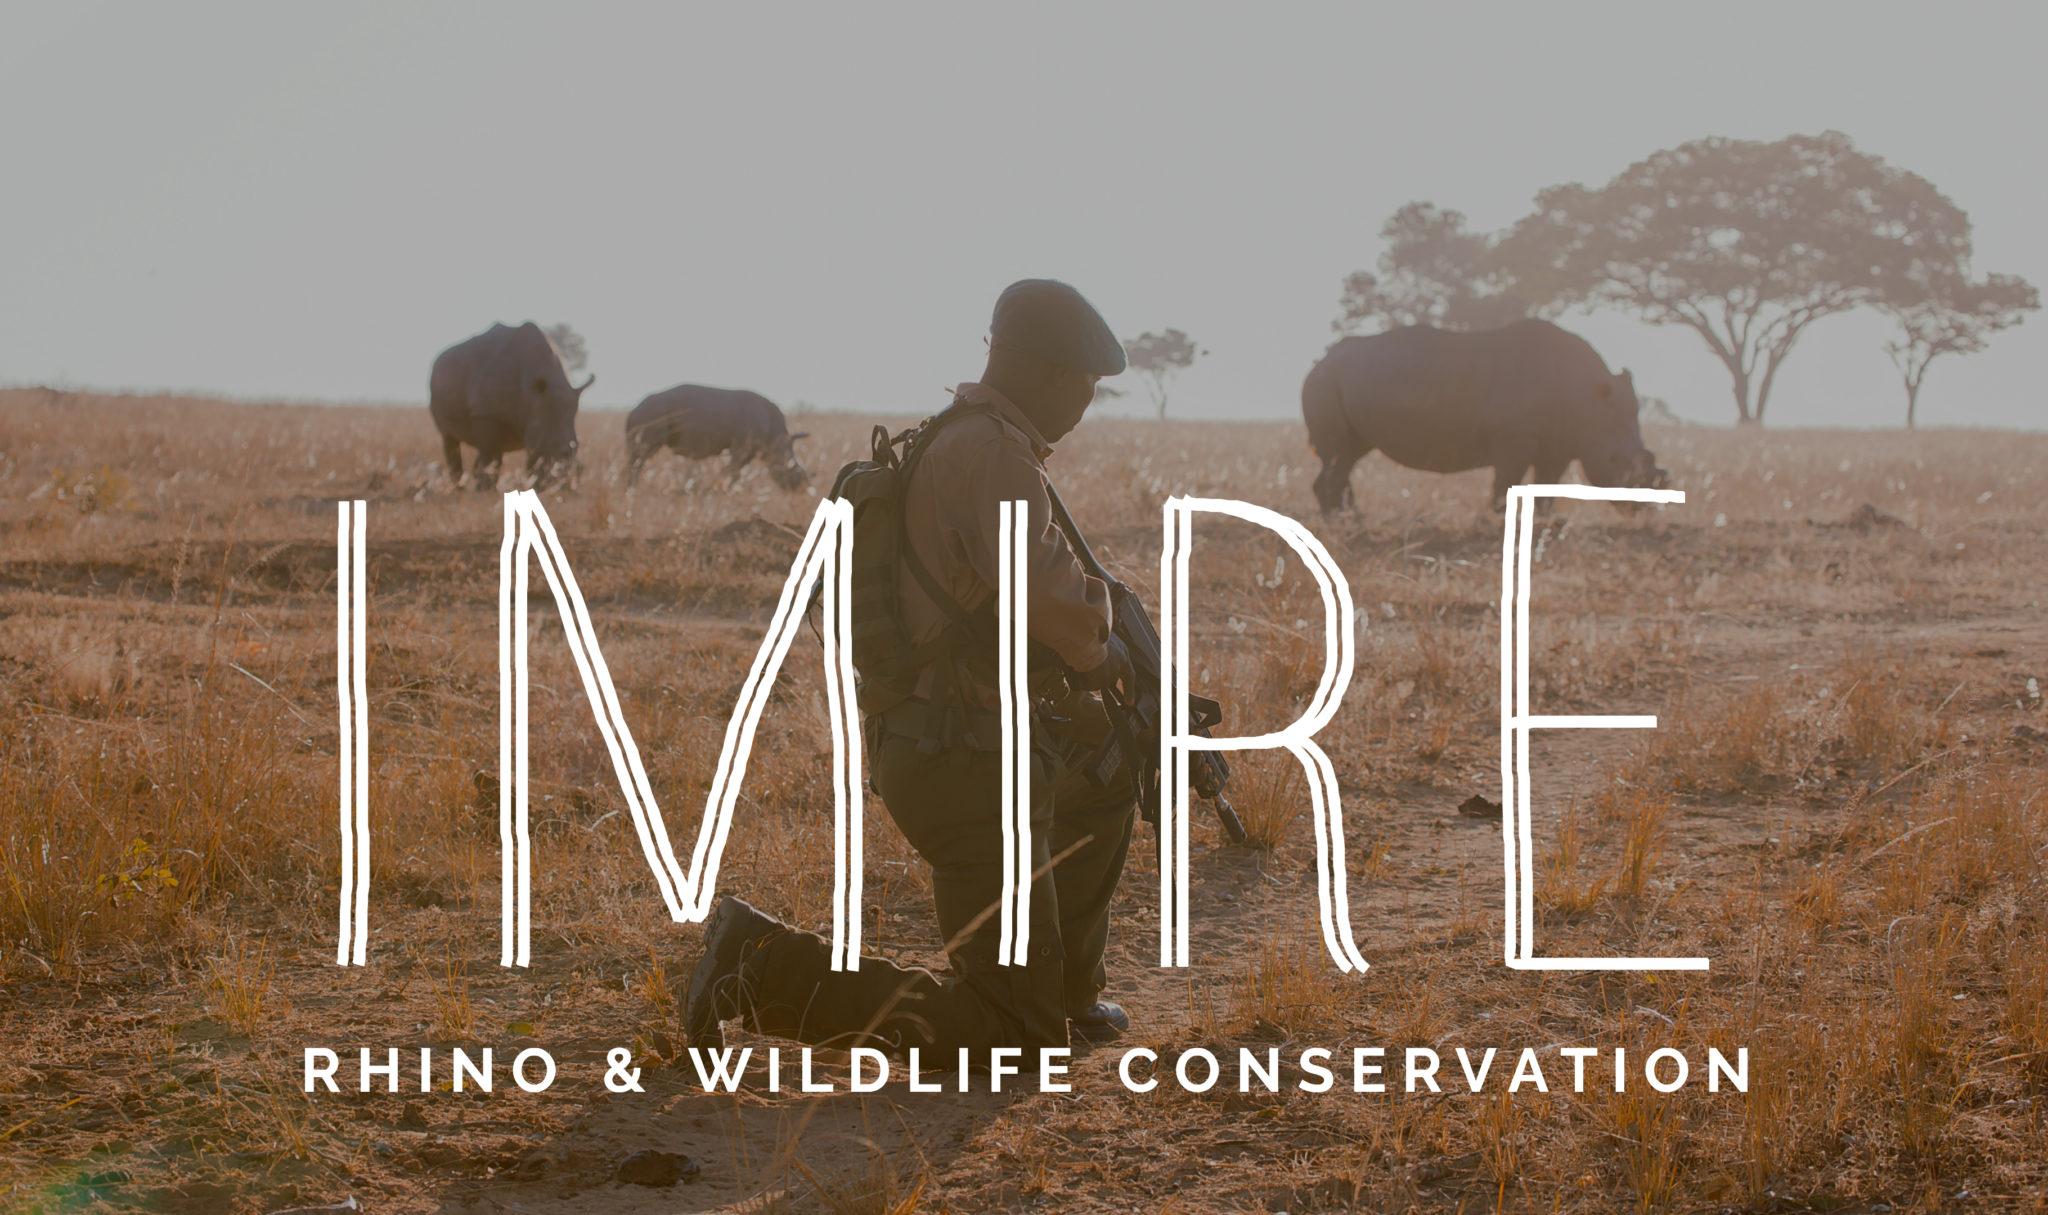 Imire Rhino & Wildlife Conservation film